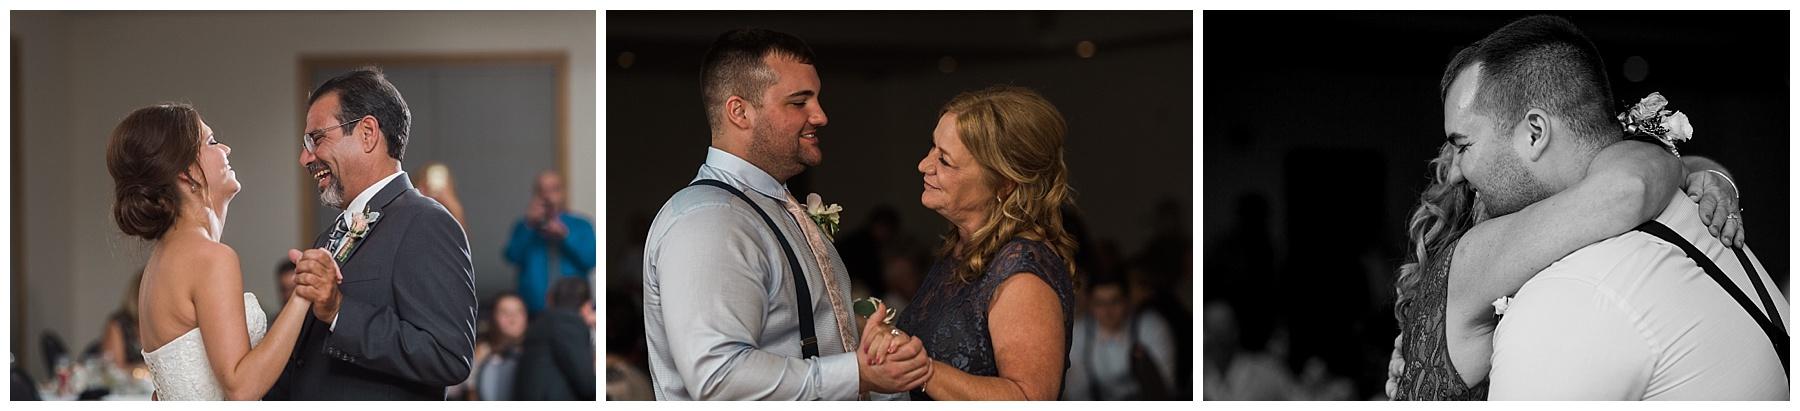 LAR Weddings_The Links at Firestone Wedding_Youngstown Ohio Wedding Photographer